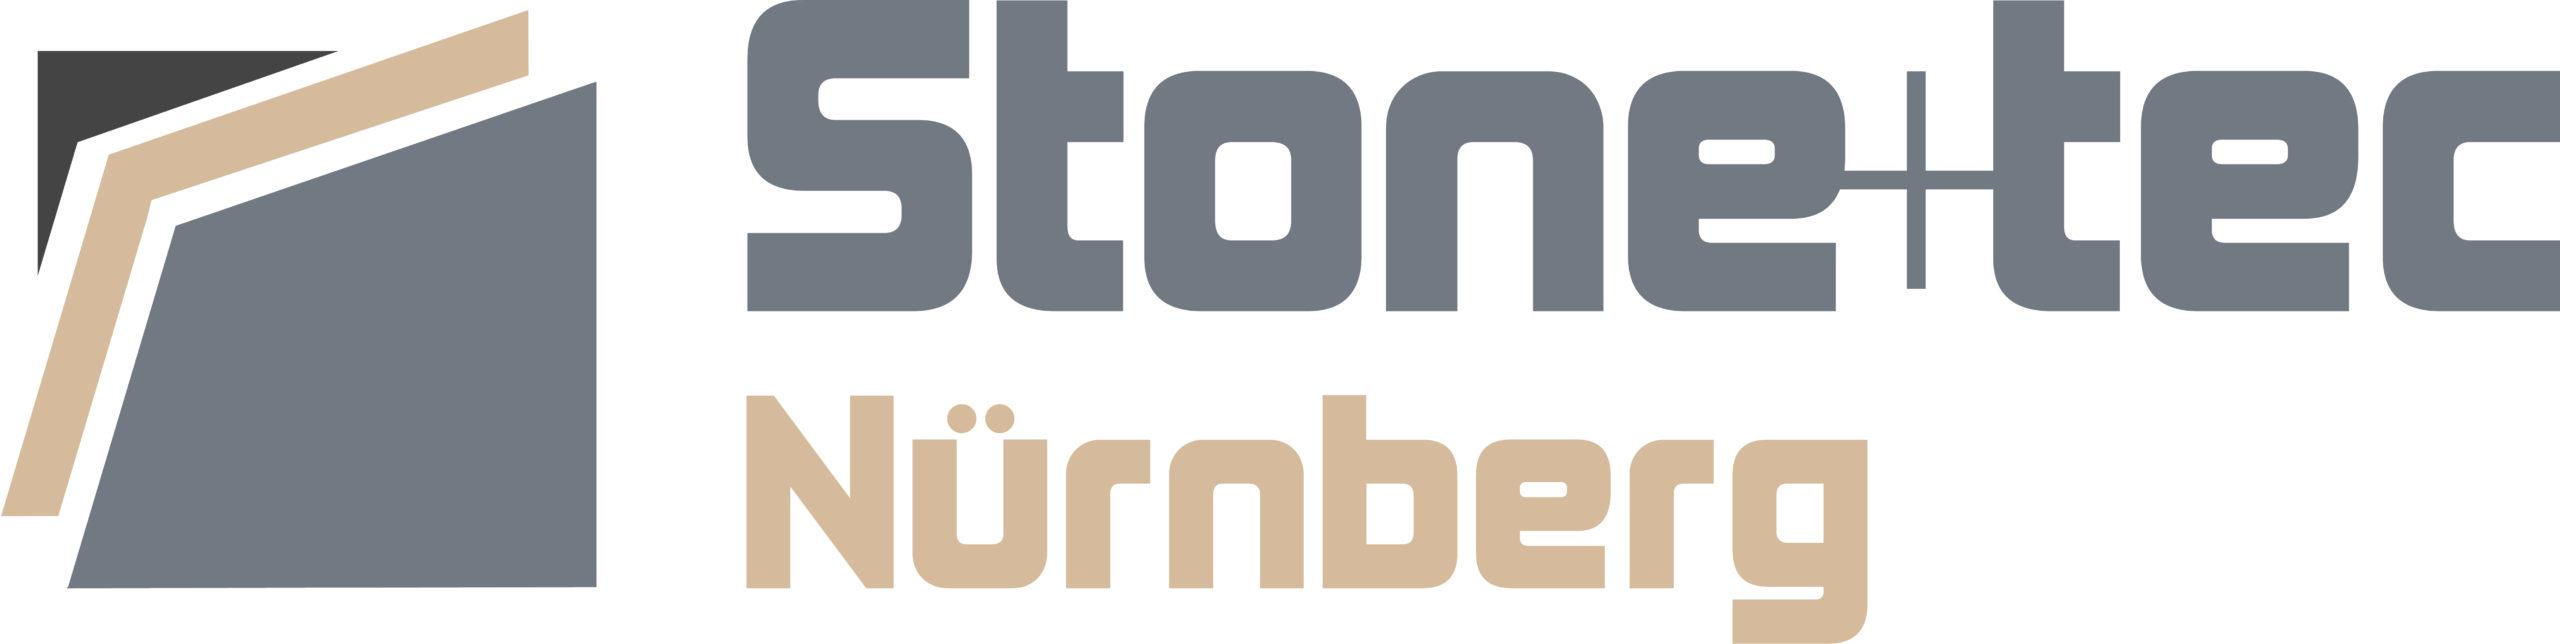 (Logo: www.stone-tec.com)